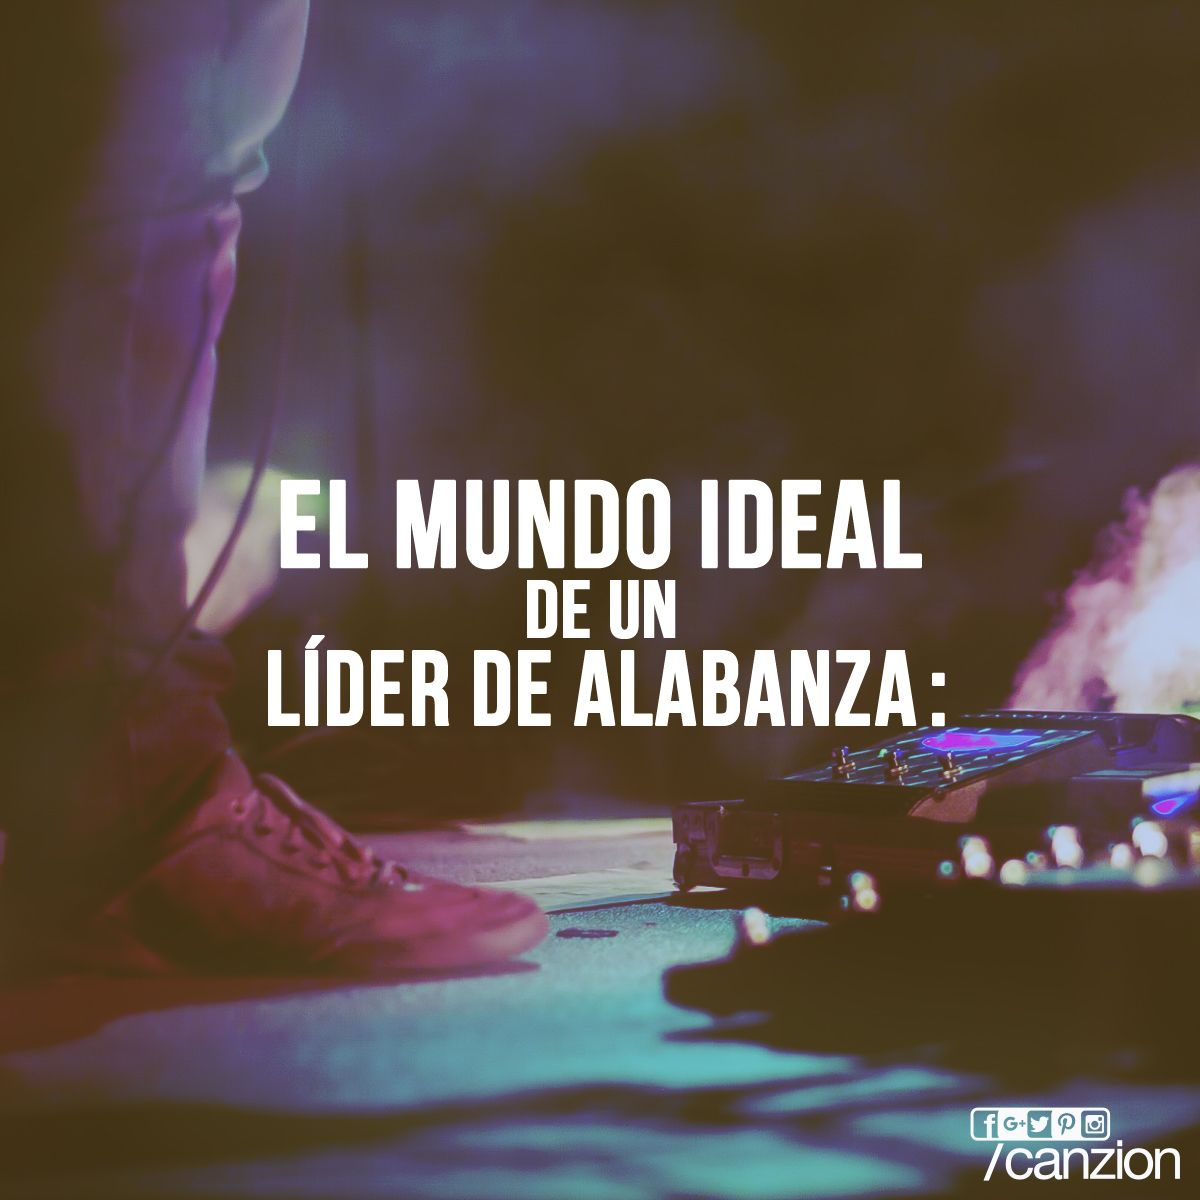 Un poco de humor, compártelo con tus amigos del #GrupoDeAlabanza. #EnUnMundoIdeal